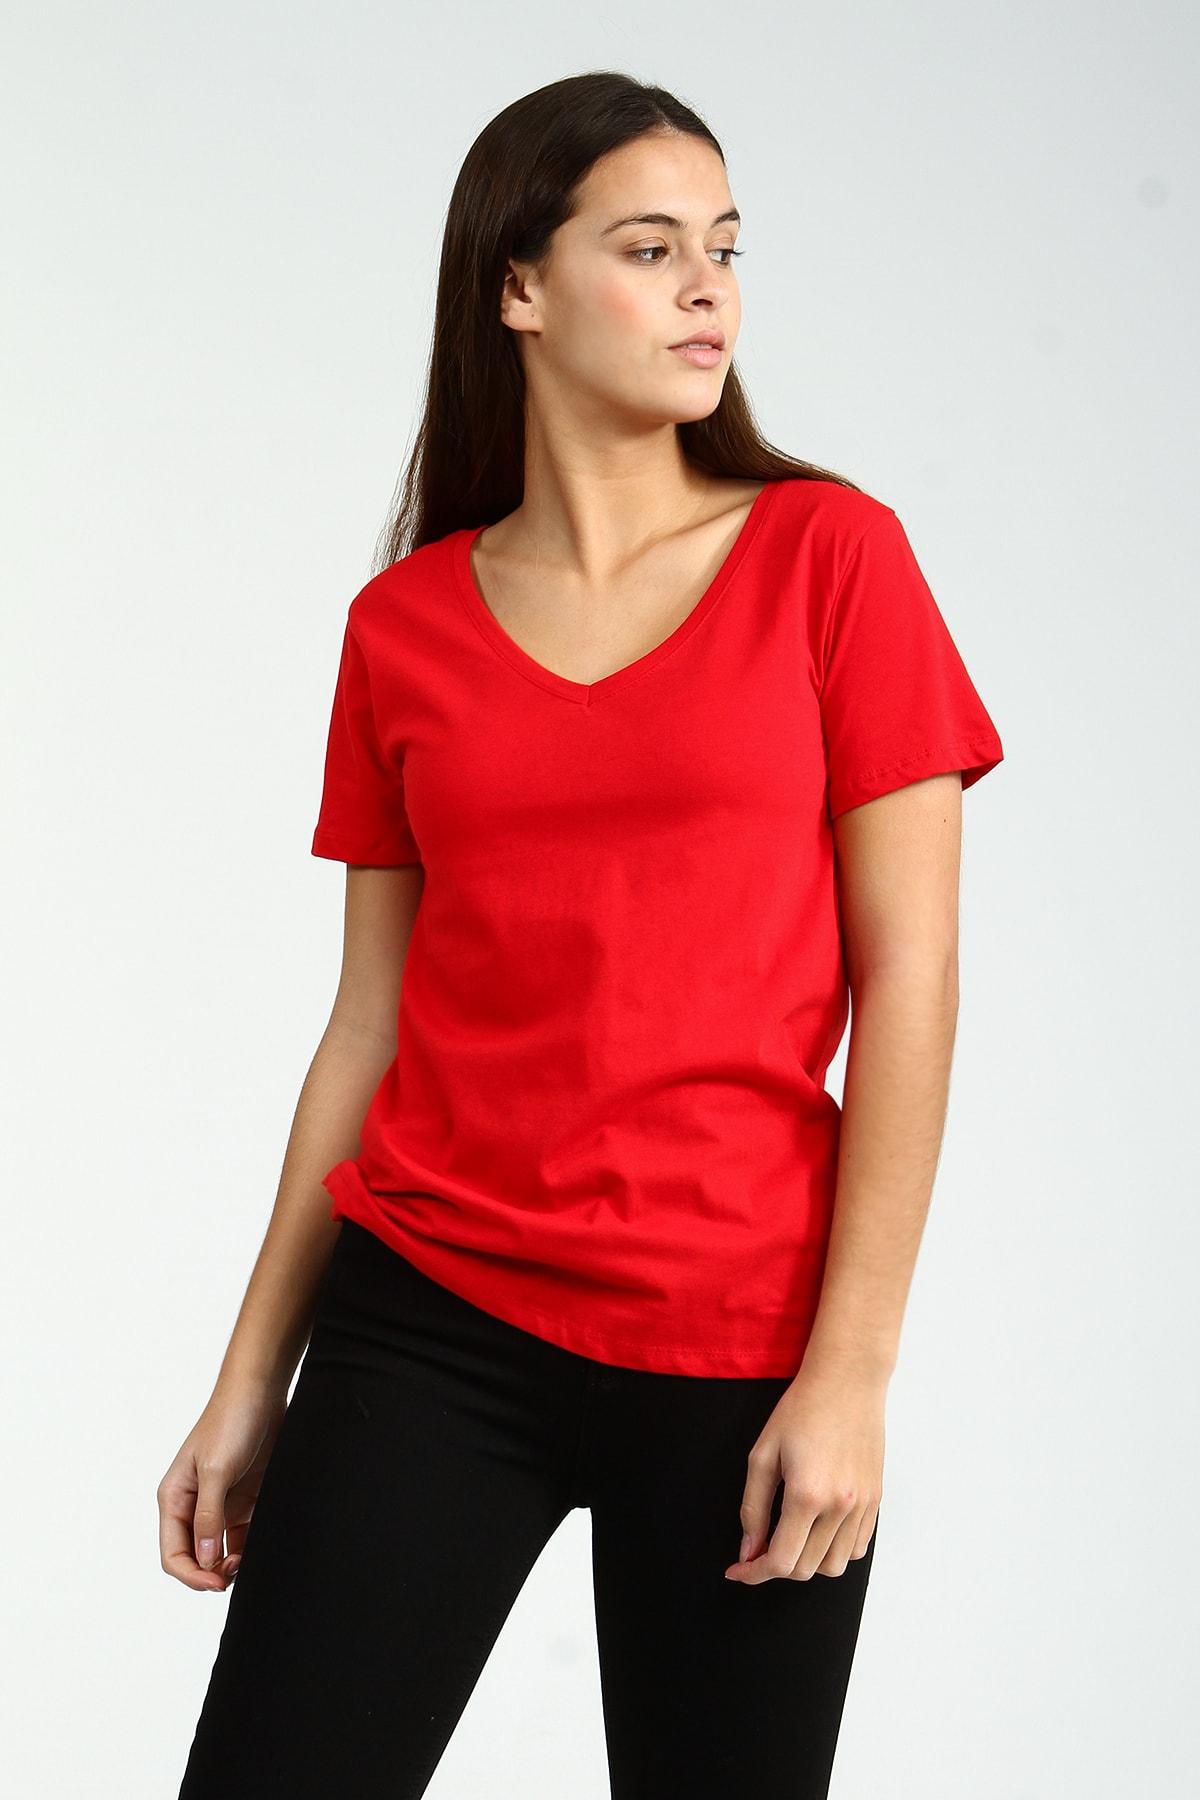 Collezione Kırmızı V Yakalı Kısa Kollu Basic Kadın Tshirt 1